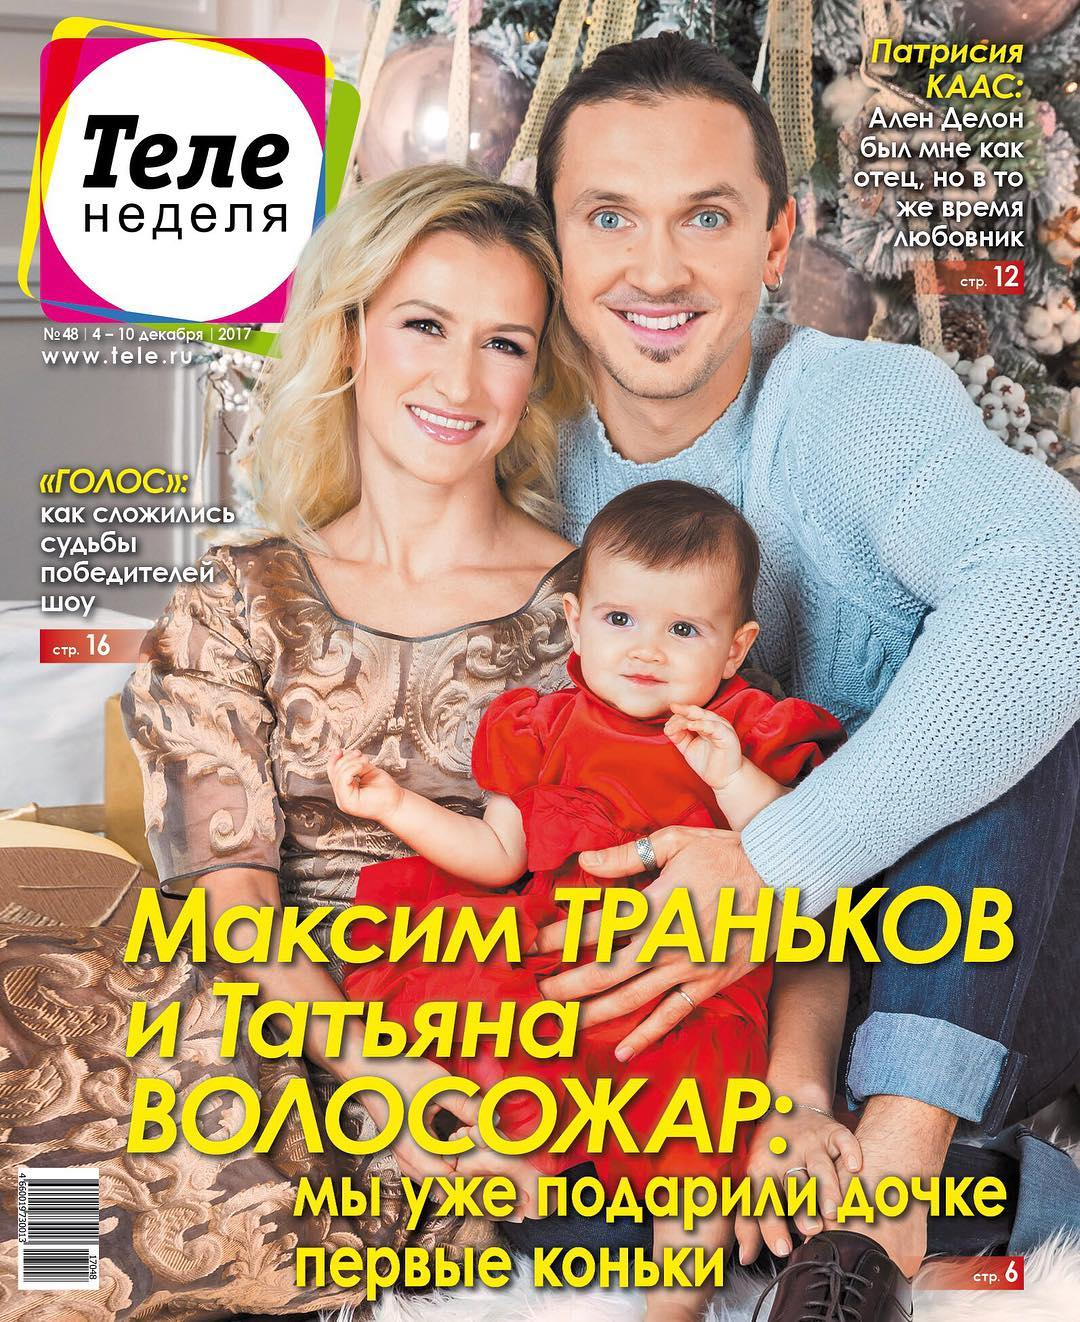 Татьяна Волосожар - Максим Траньков-4 - Страница 11 DPqLGqCWAAEzvb3